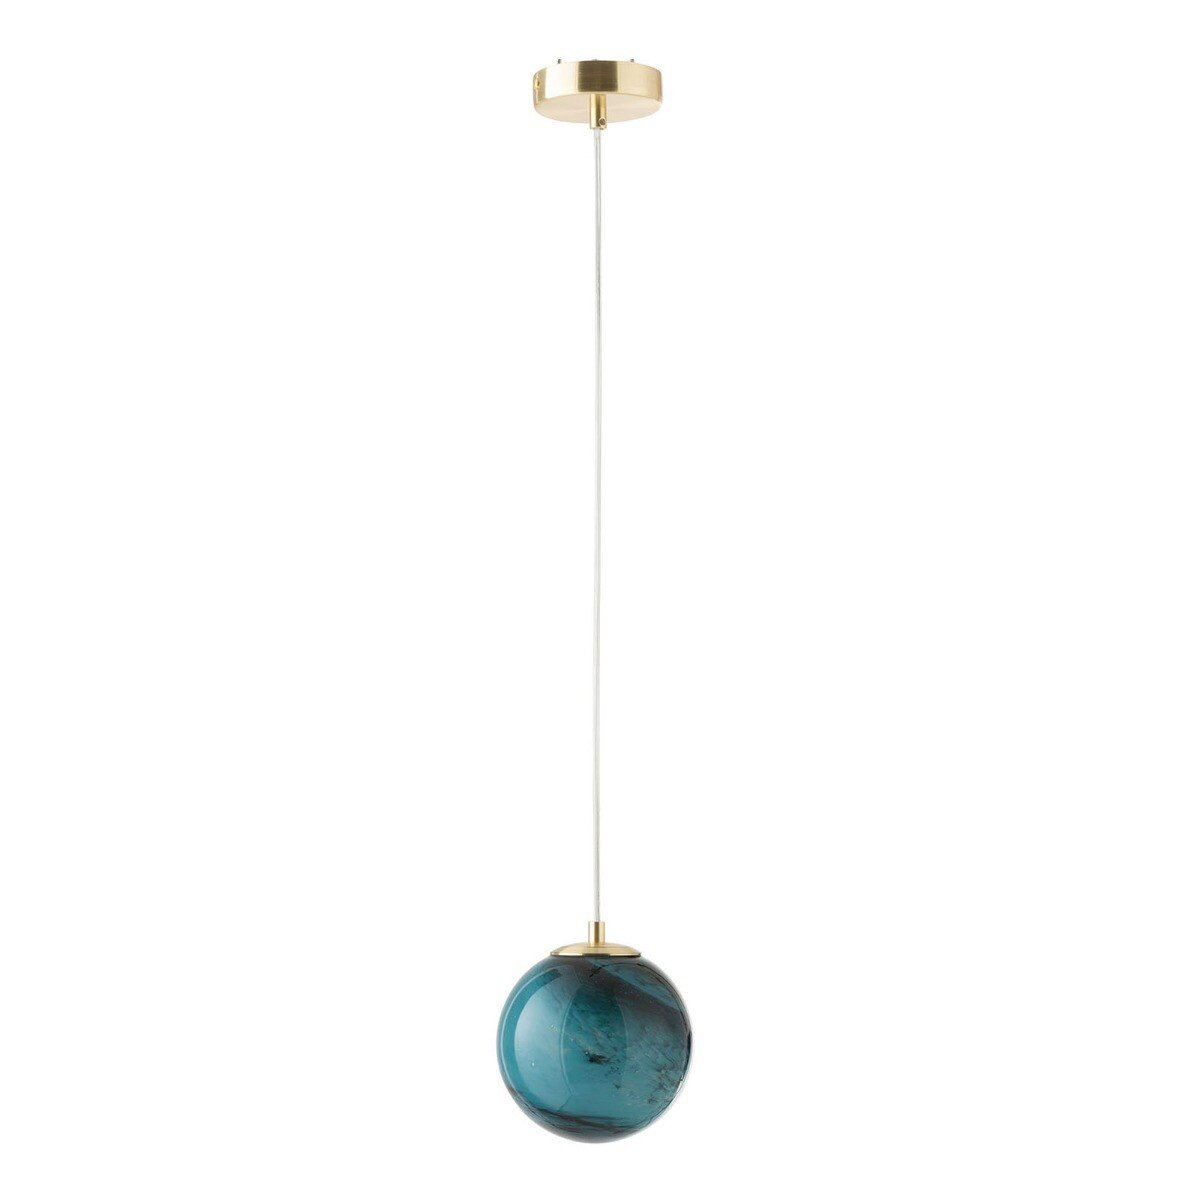 J-Line Hanglamp Dany Rond Glas 151 x 14,5 x 14,5